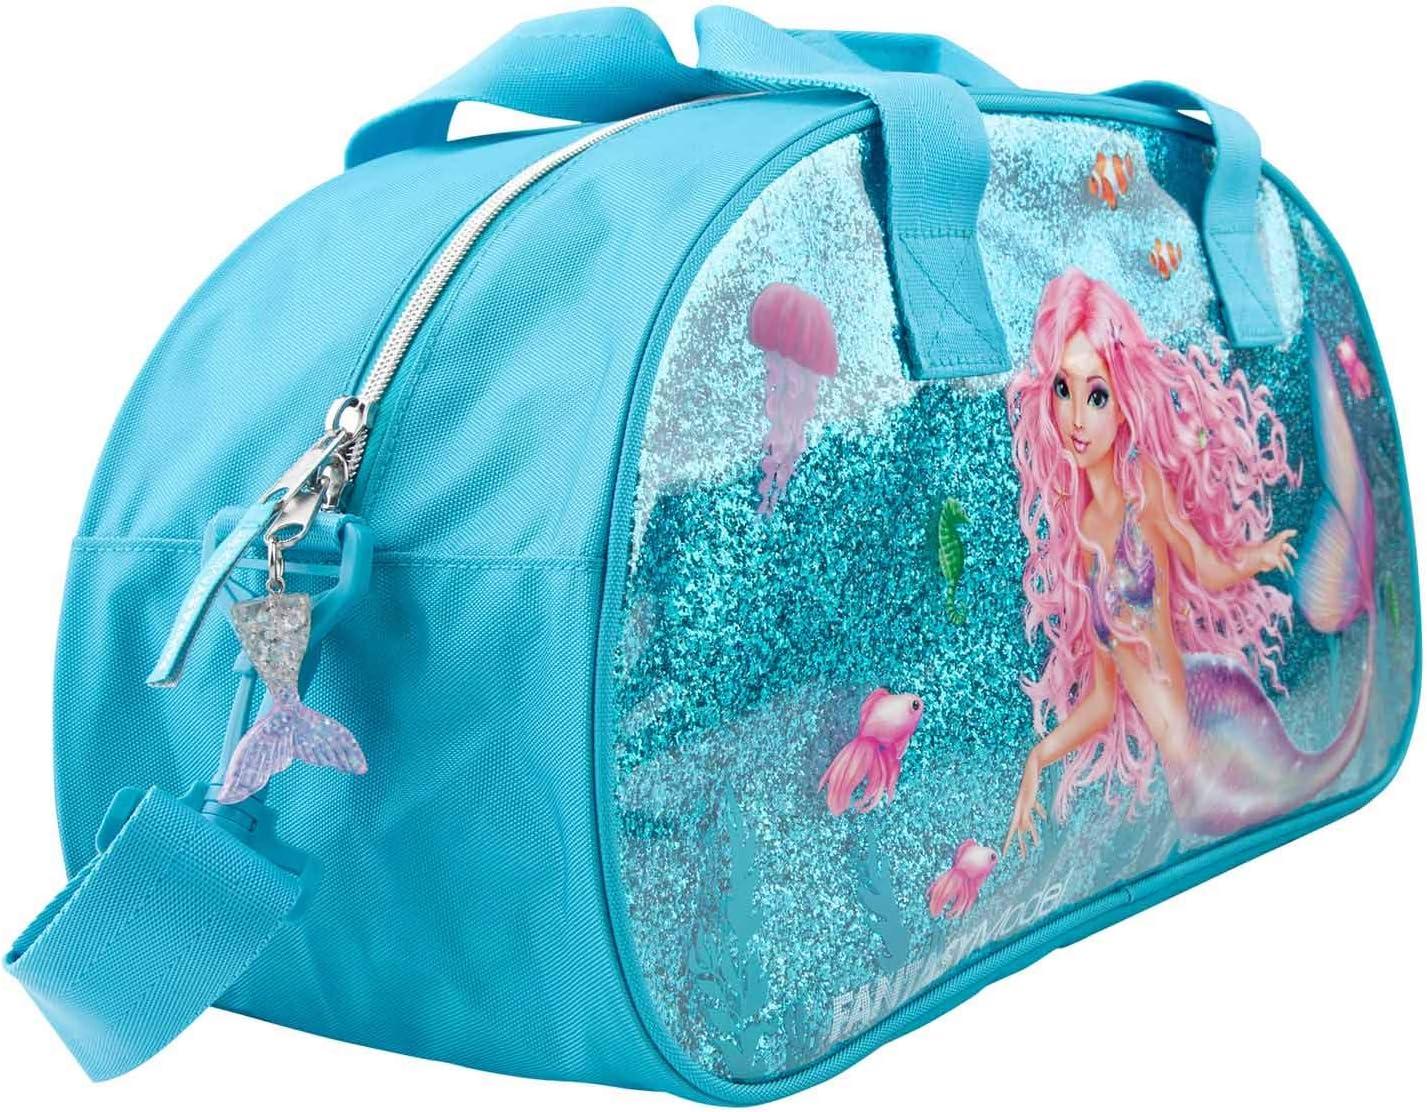 43 x 15 x 23 cm ca blau Depesche 11048 Sporttasche Fantasy Model Mermaid